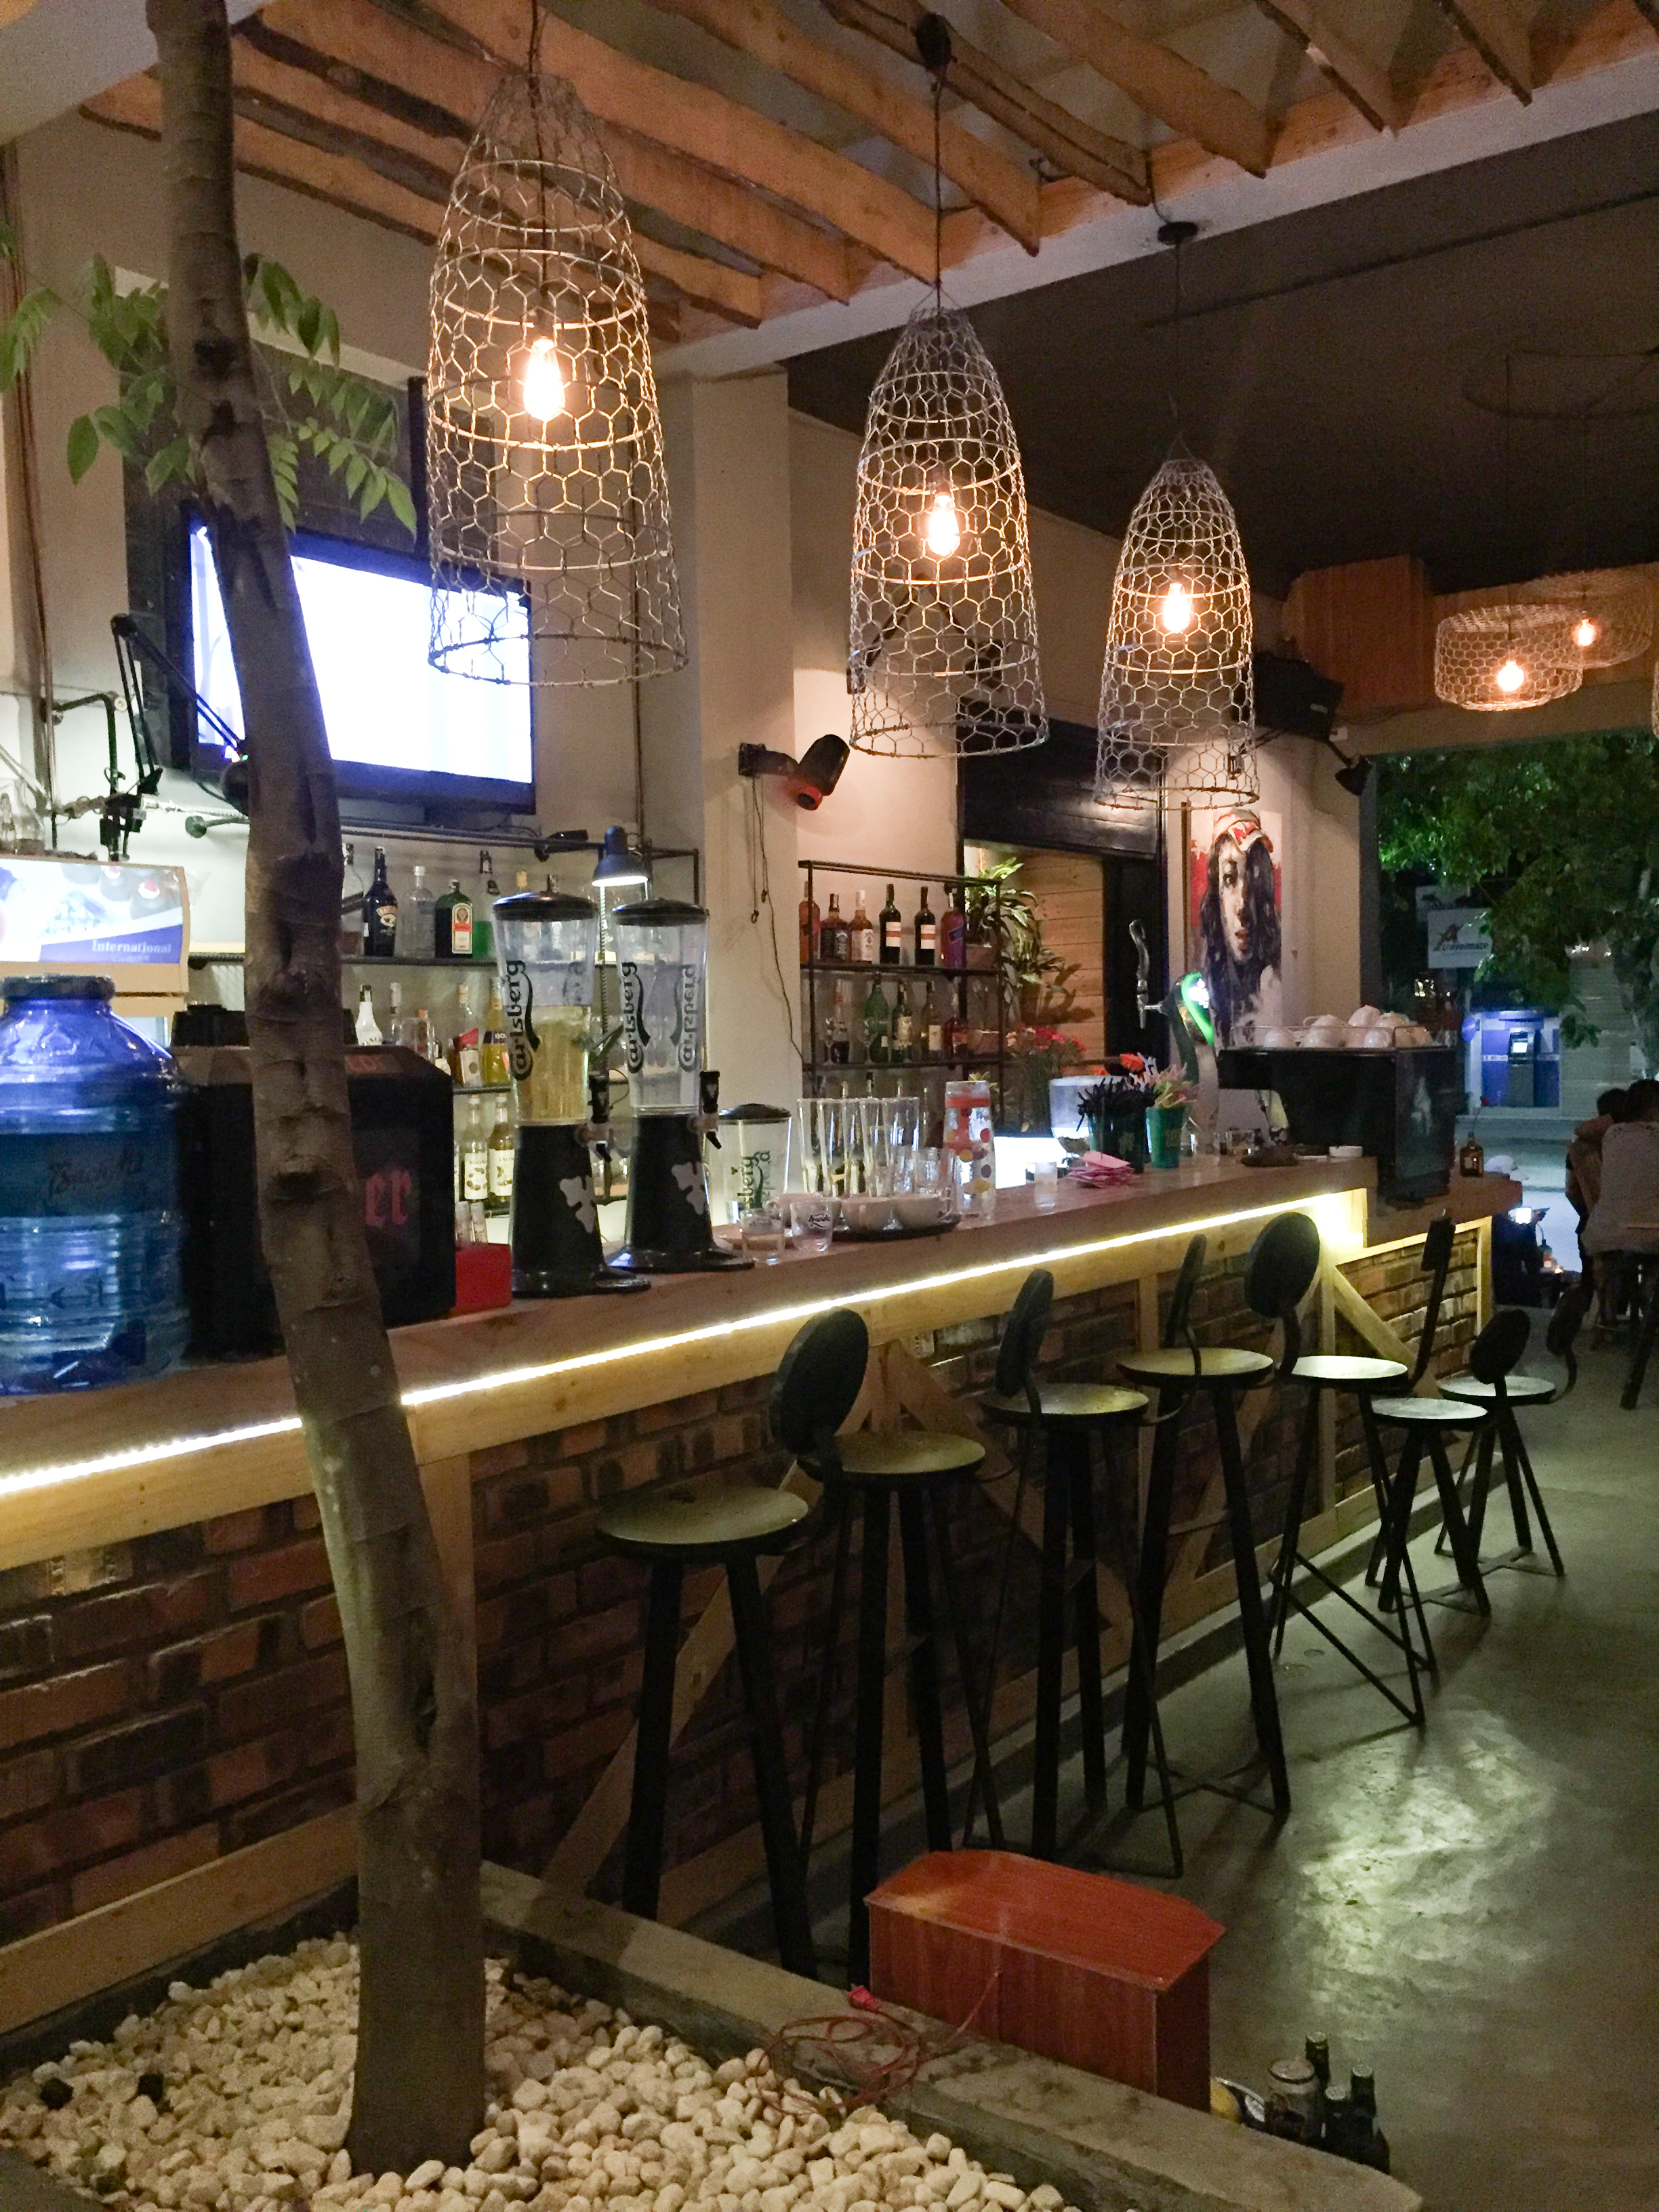 Trendy bars are aplenty in Hue